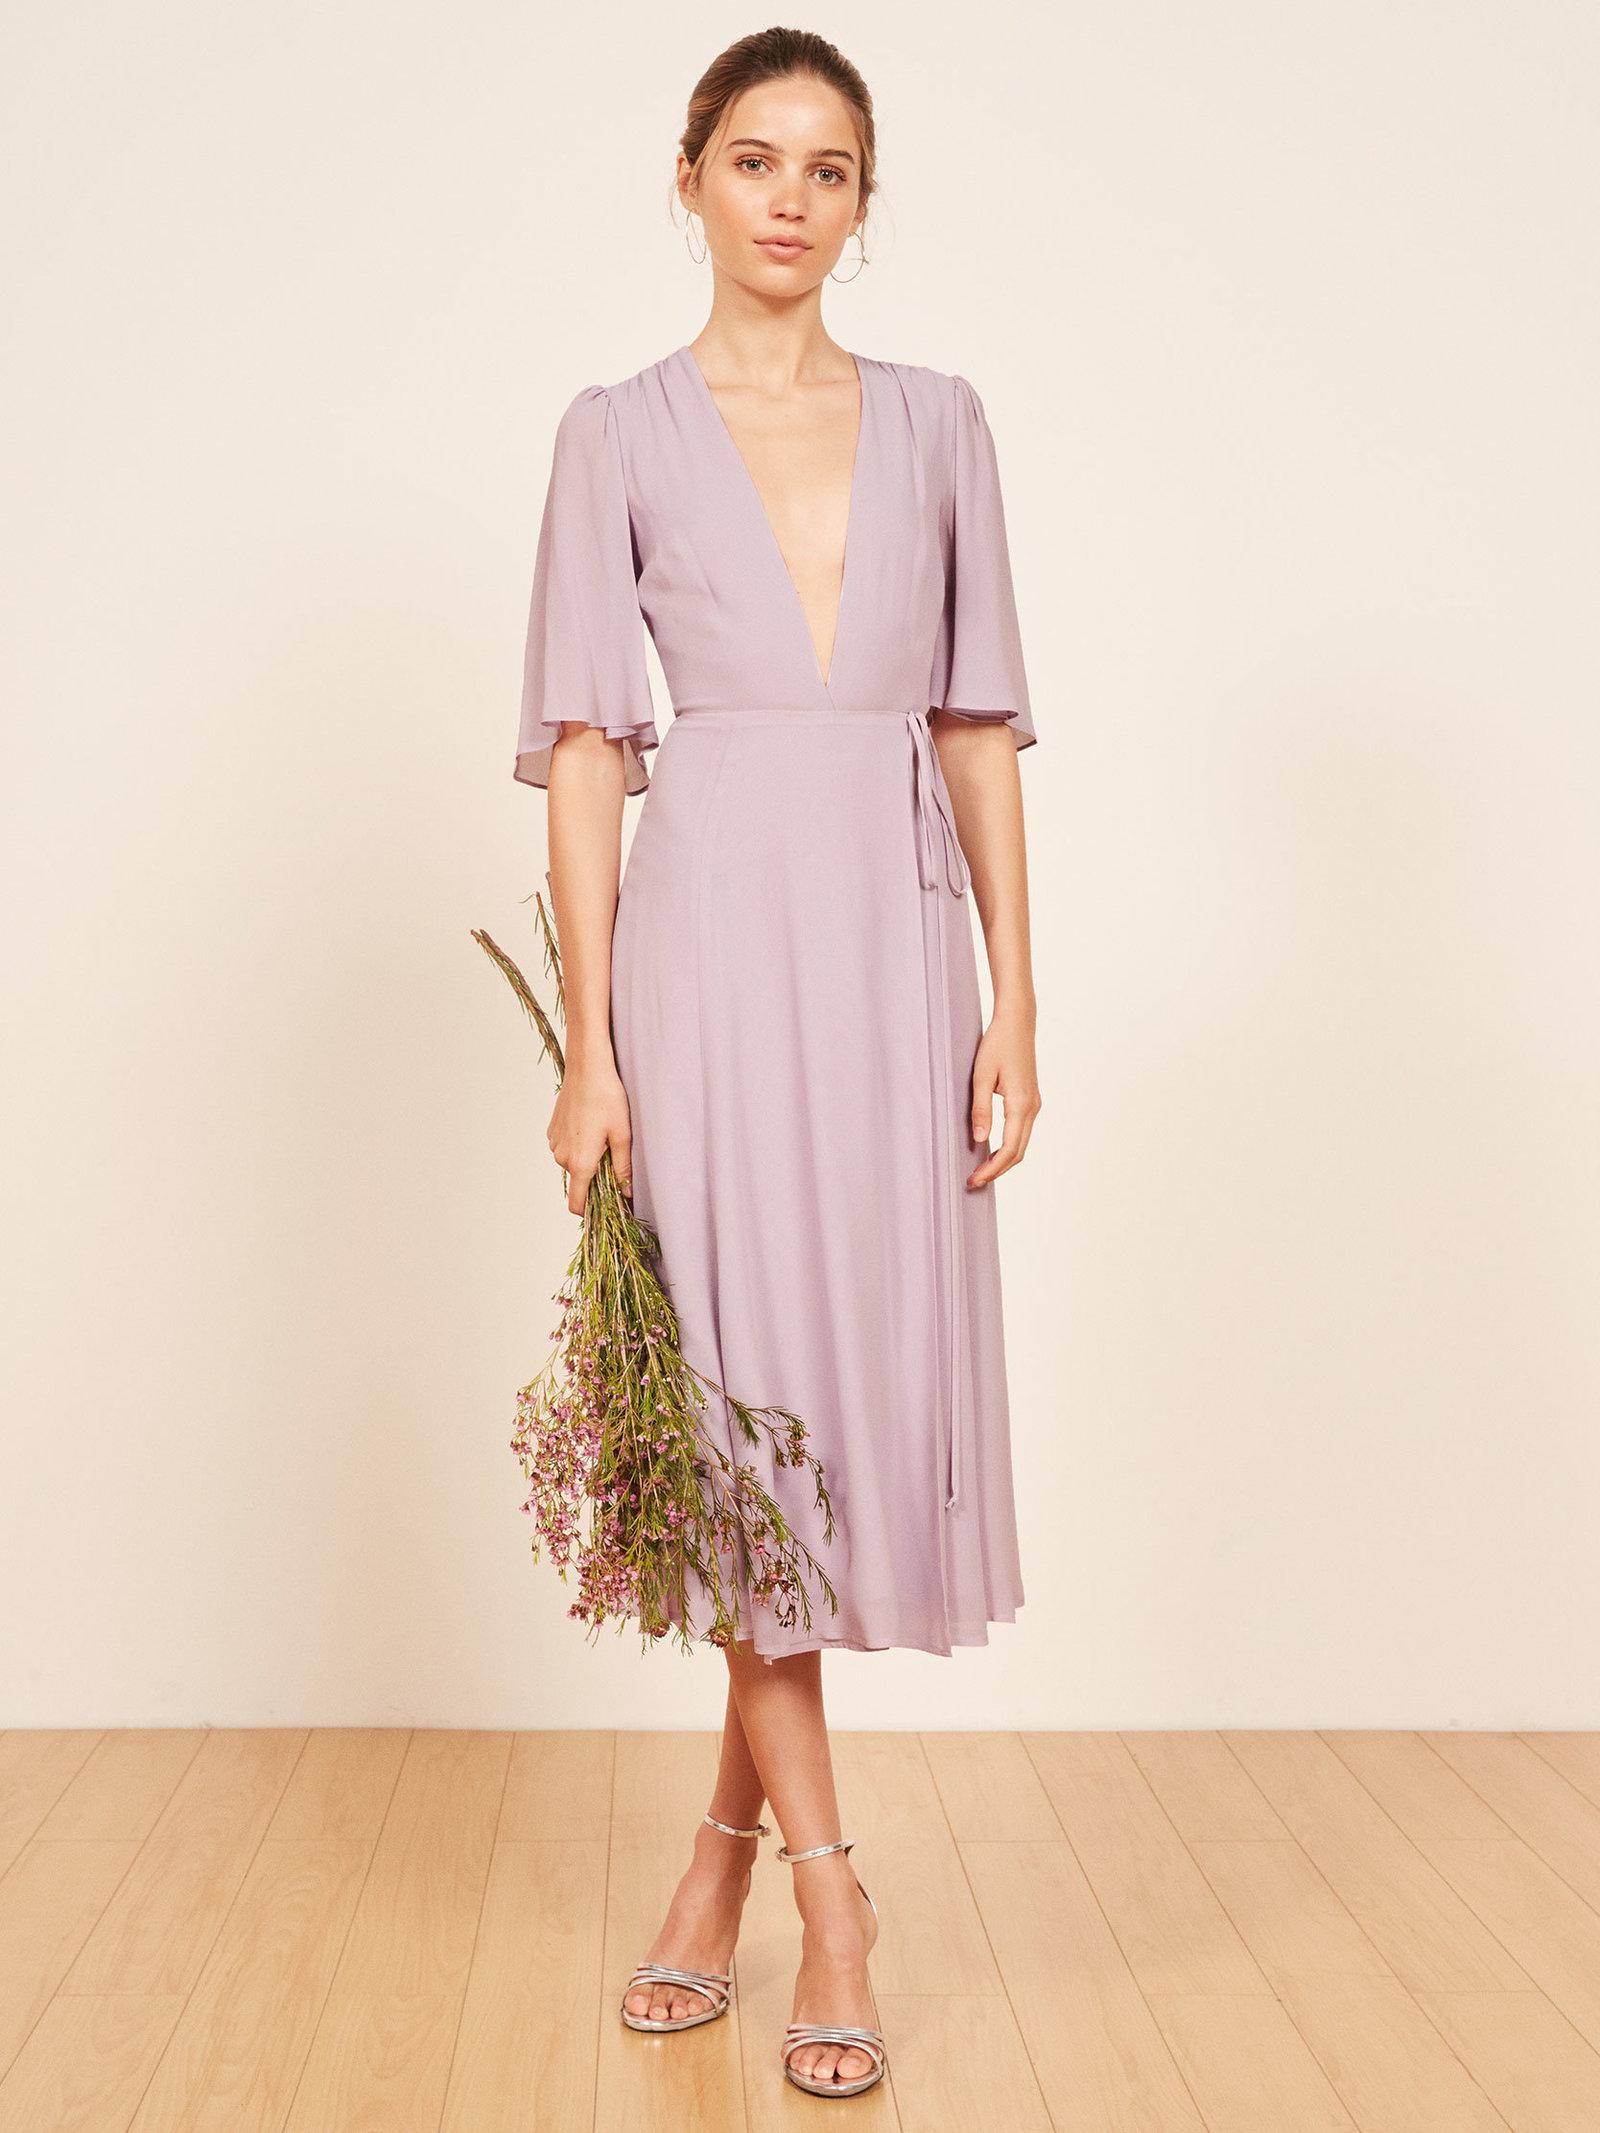 20 Wedding Guest Dresses You Can Wear Again & Again